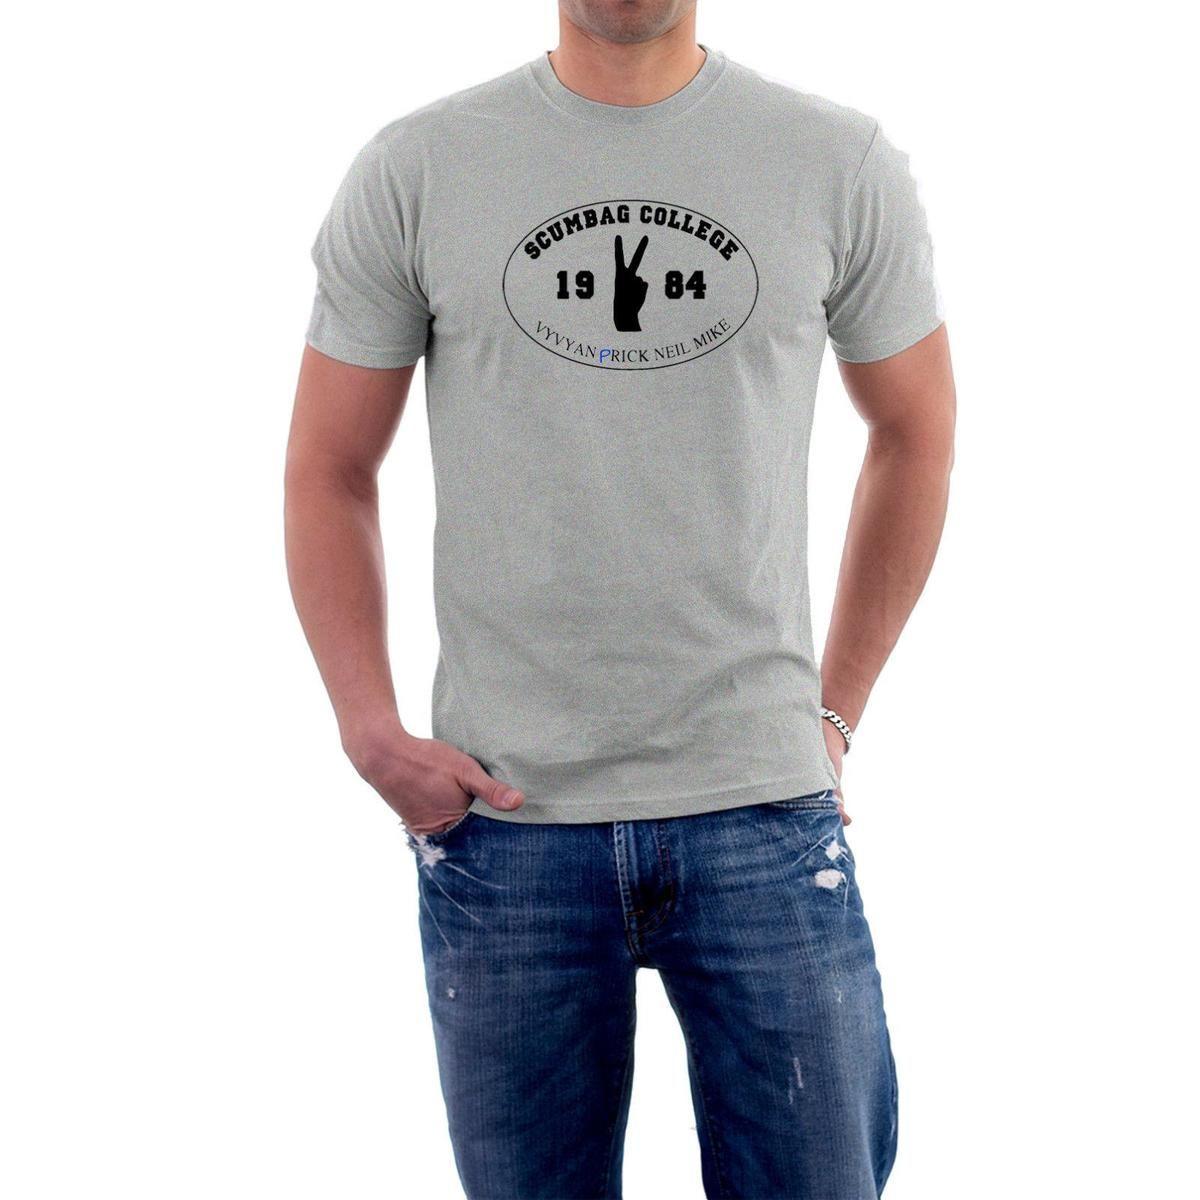 cc4f2de7a63e5 Scumbag College T-shirt. Young Ones Tribute Tee. S- 5XL University Challenge